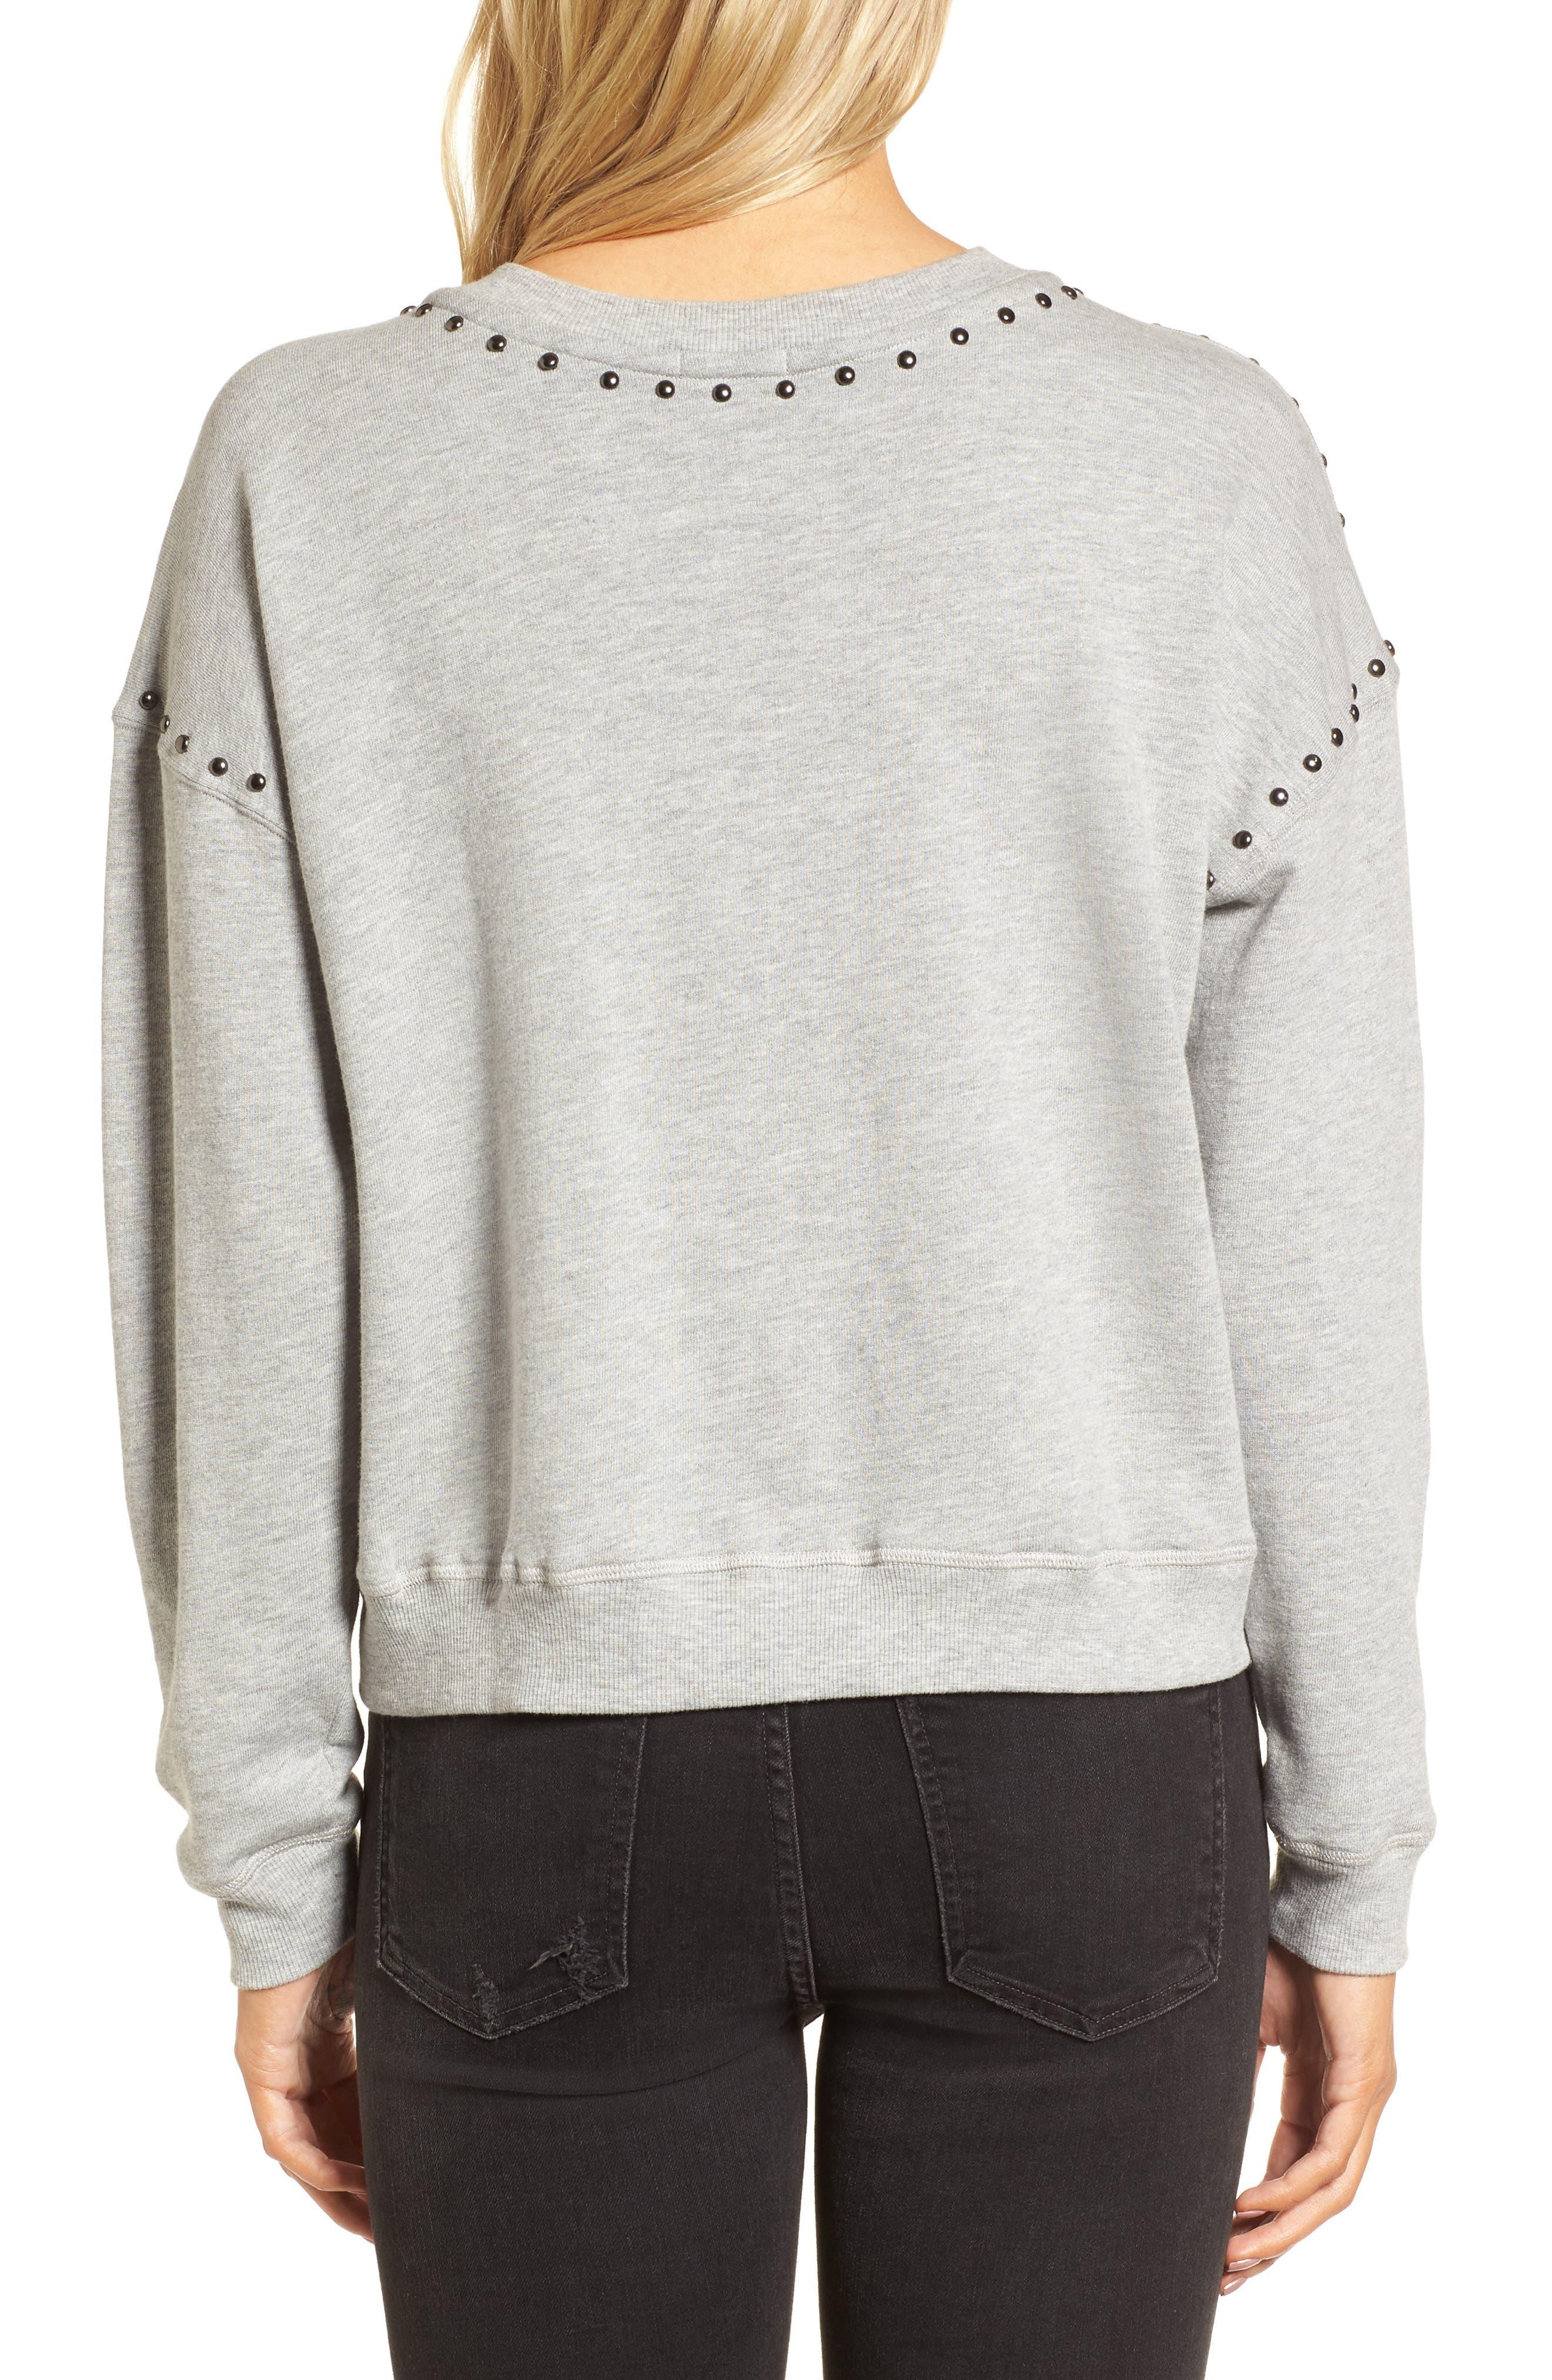 Wilson Studded Sweatshirt,                             Alternate thumbnail 2, color,                             052